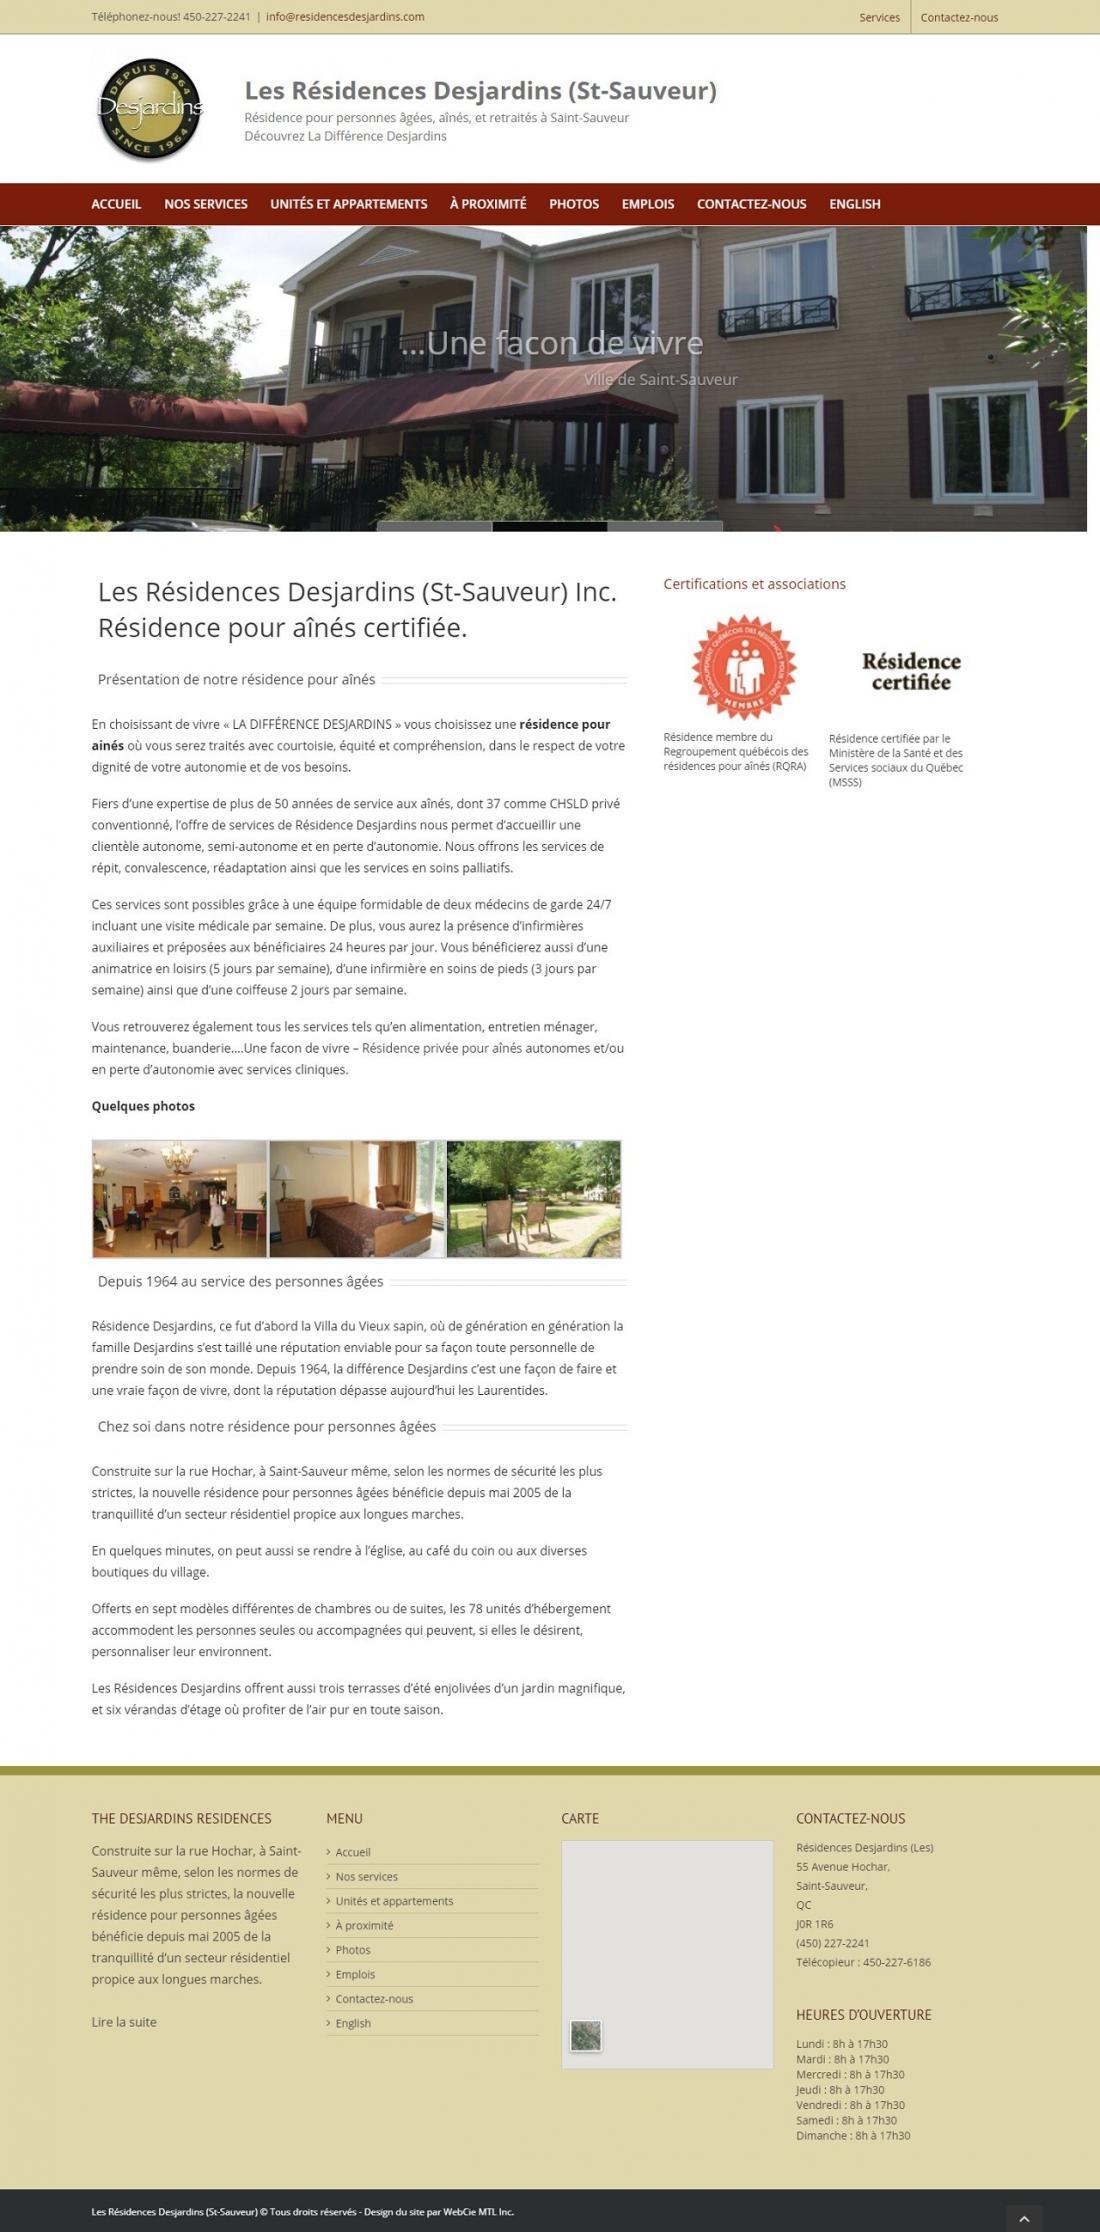 Résidence Desjardins, WebCie portfolio, photo